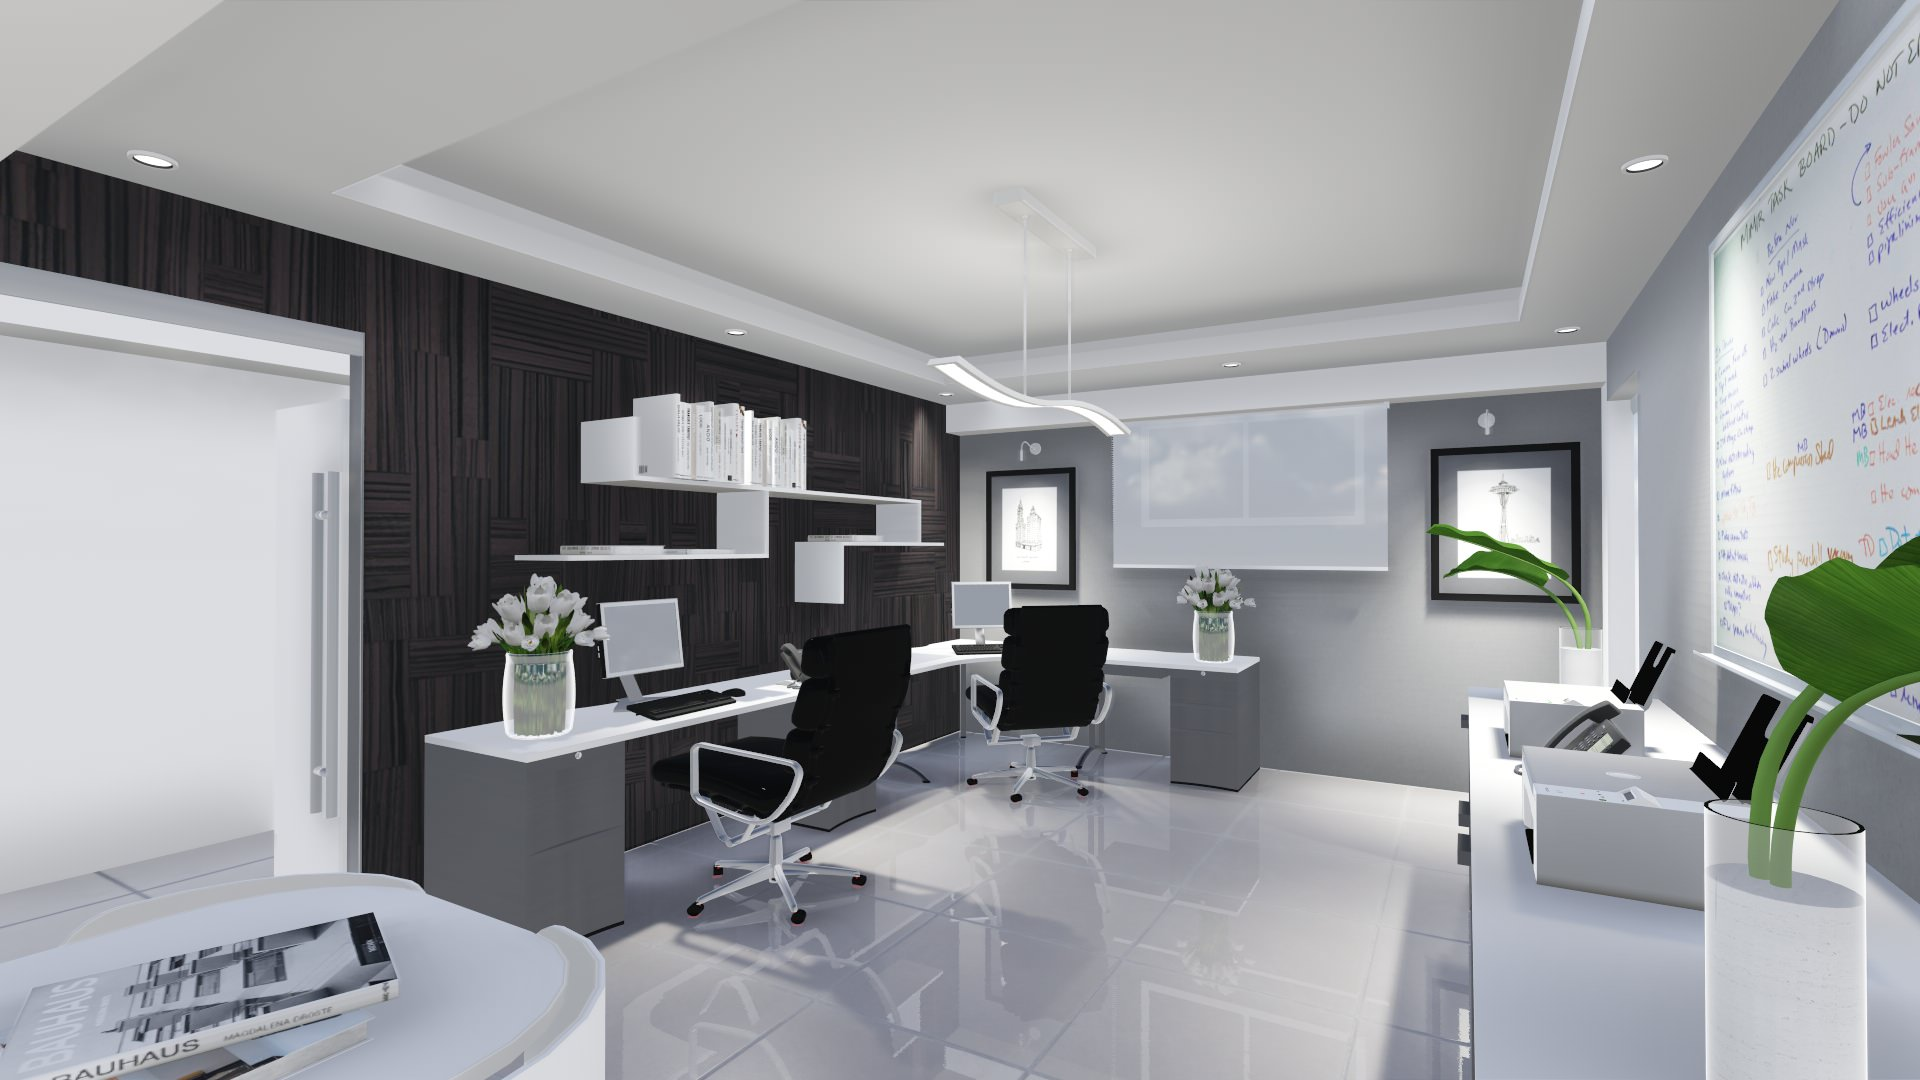 proyecto oficina alco inmobiliaria neuarq